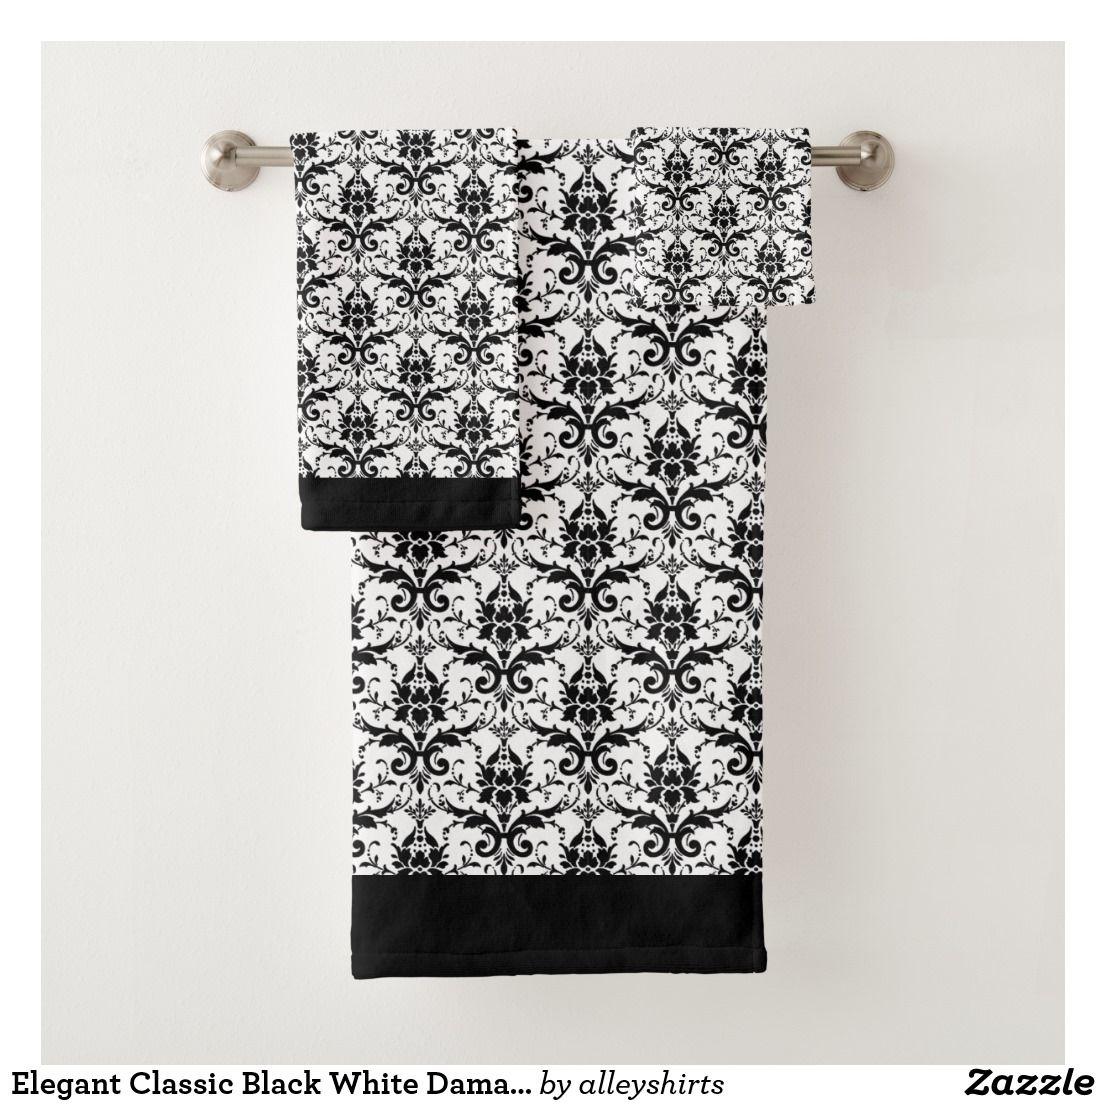 Elegant Classic Black White Damask Floral Pattern Bath Towel Set